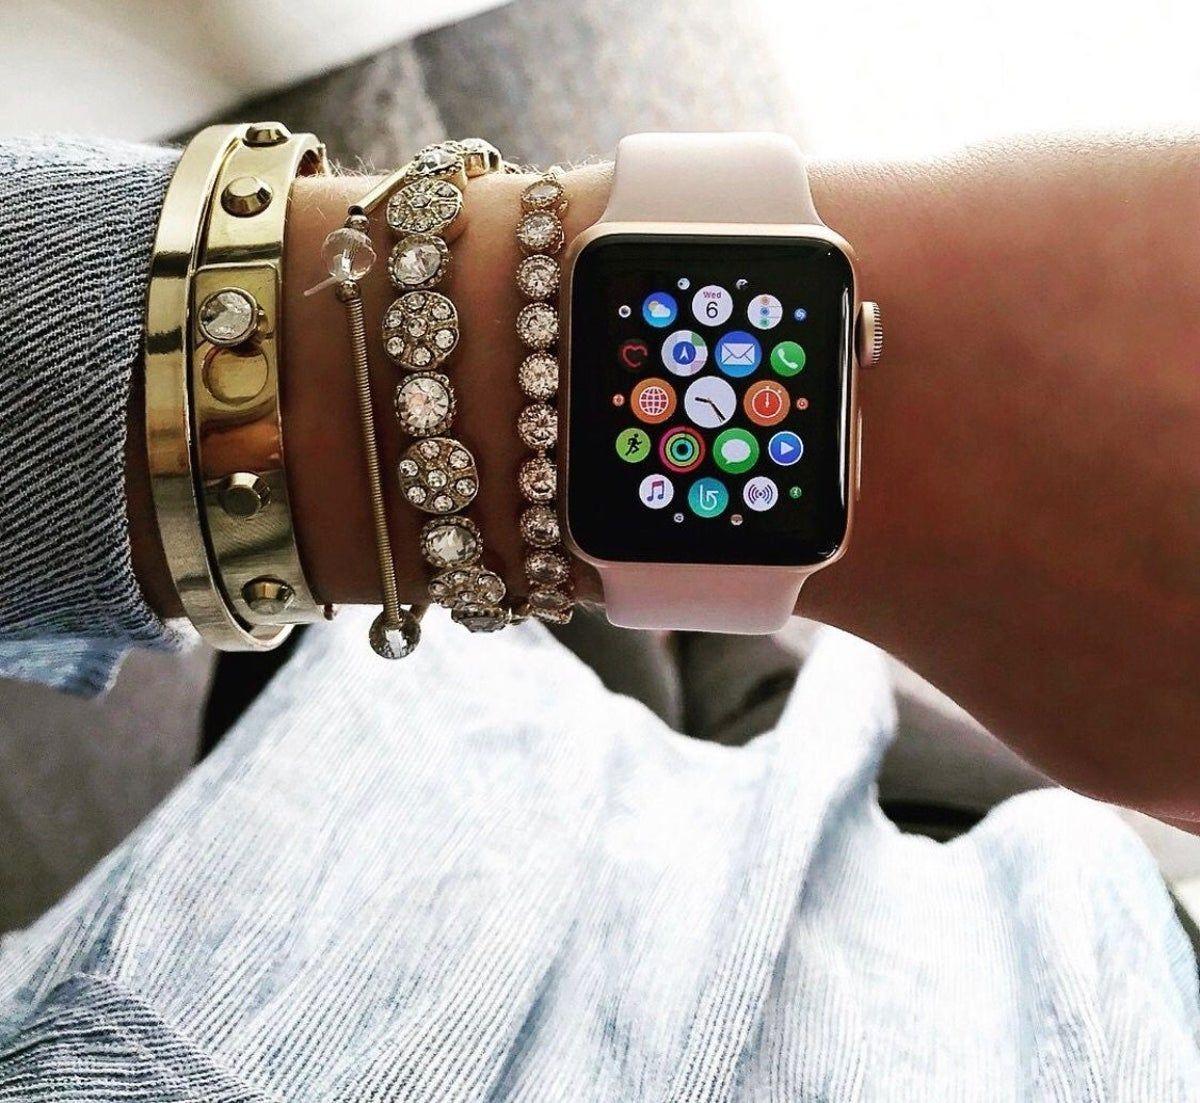 Apple Watch 44mm Pink Sand Sports Band! en 2020 Relojes